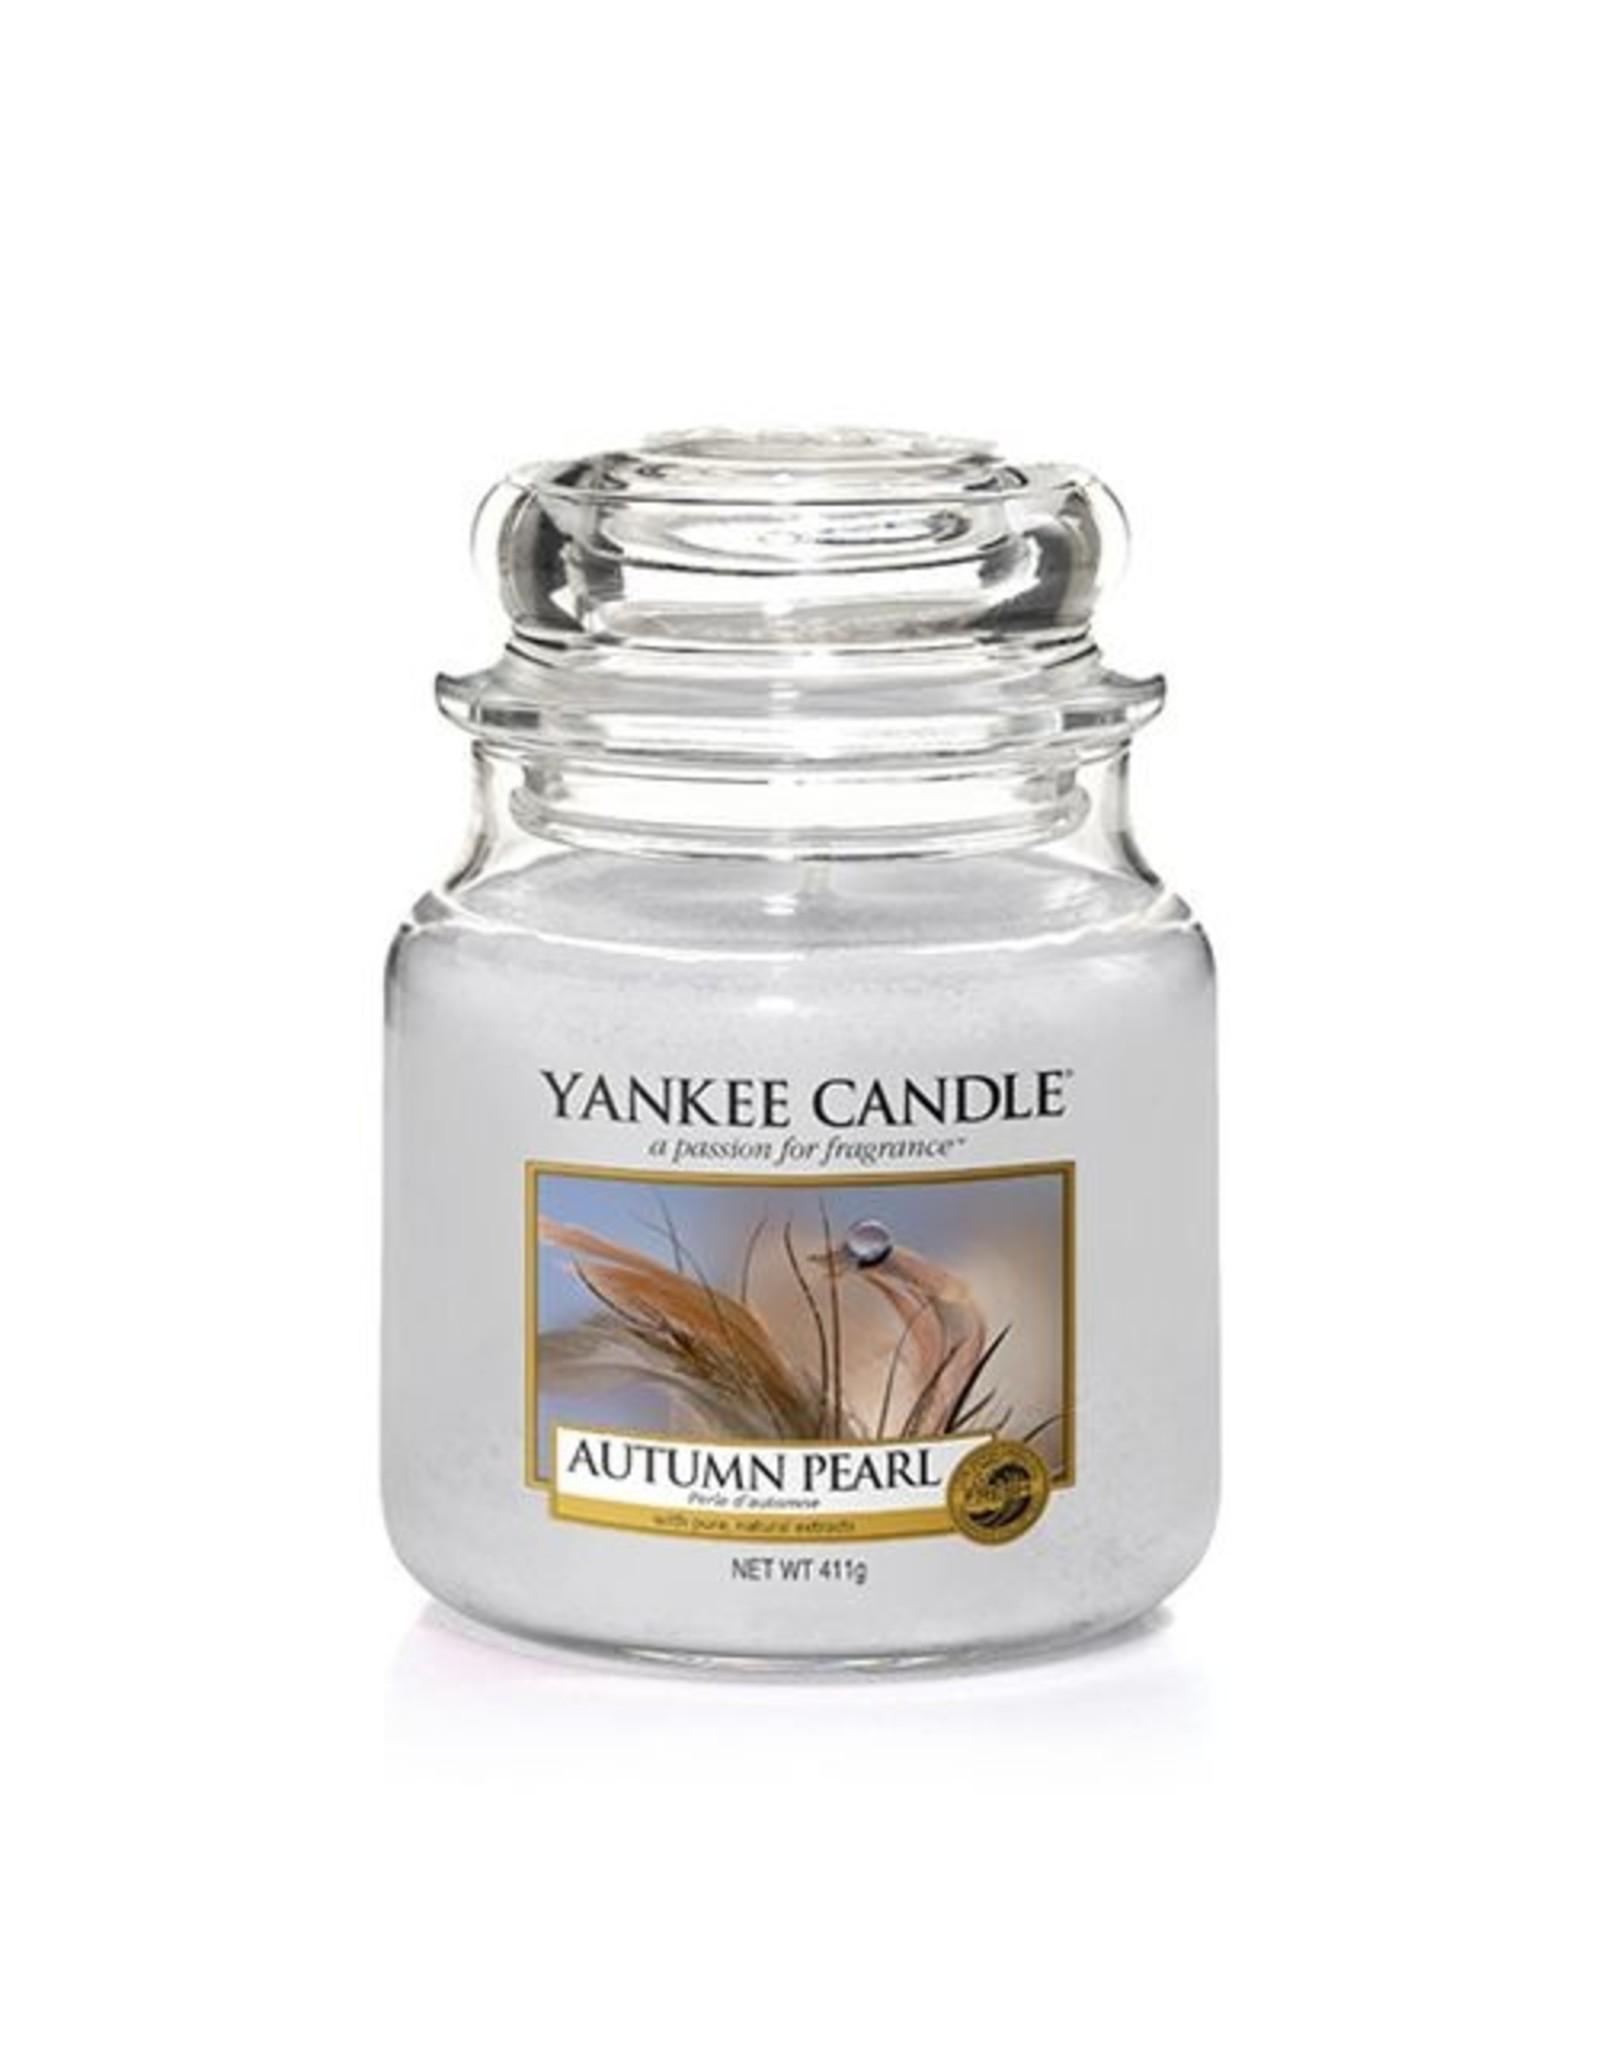 Yankee Candle Autumn Pearl Medium Jar